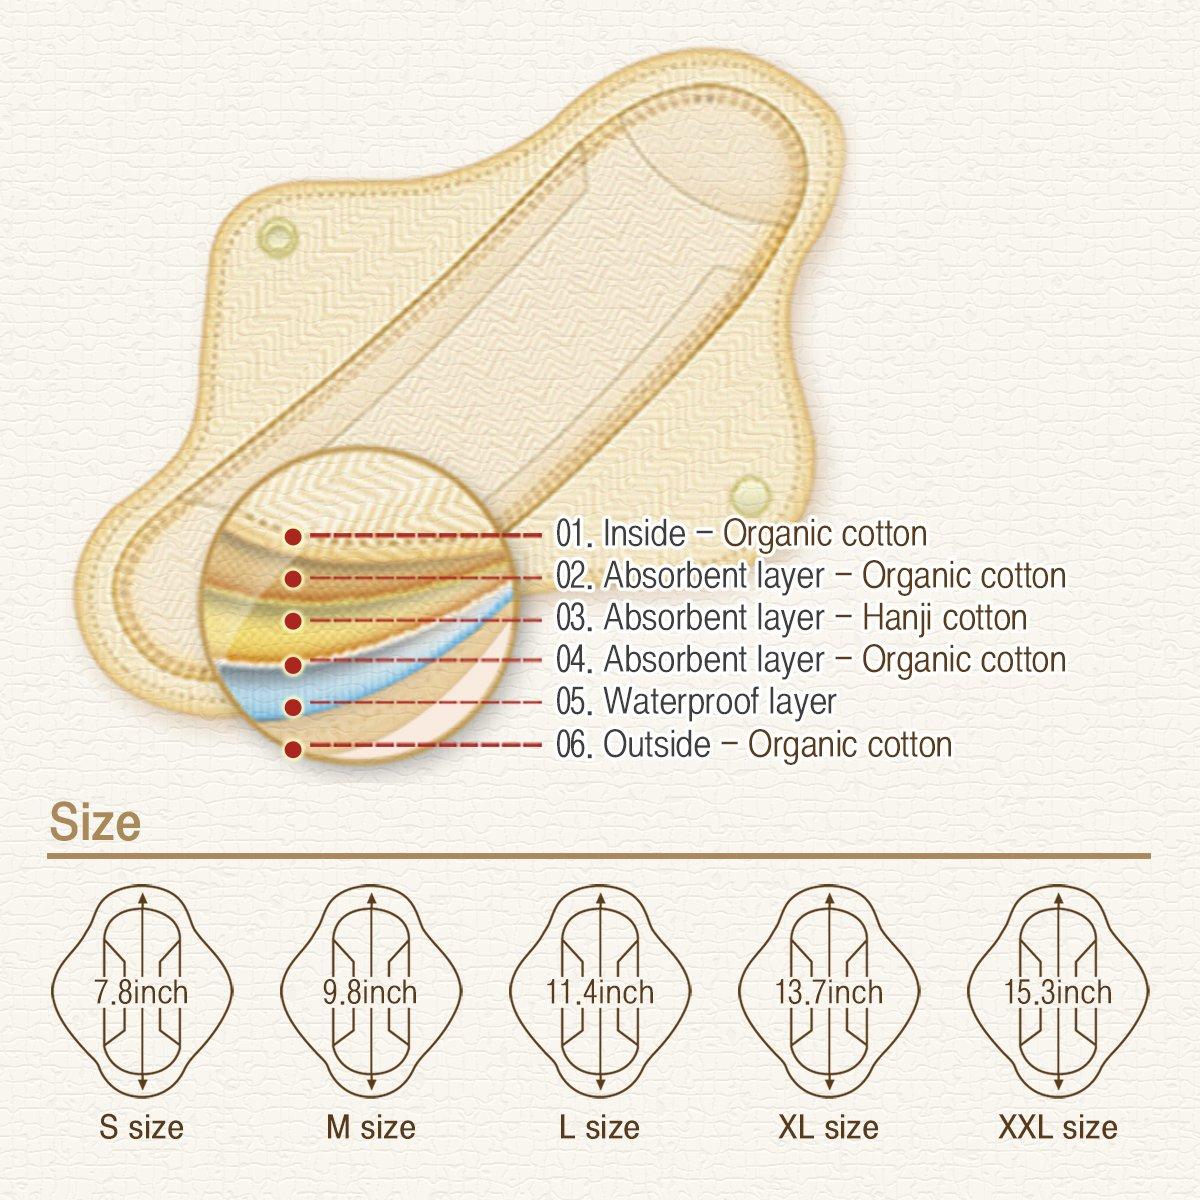 THINKECO [5 Pads] Organic-Hanji Reusable Menstrual Cotton Pads, Sanitary Napkins (XL) by THINKECO (Image #6)